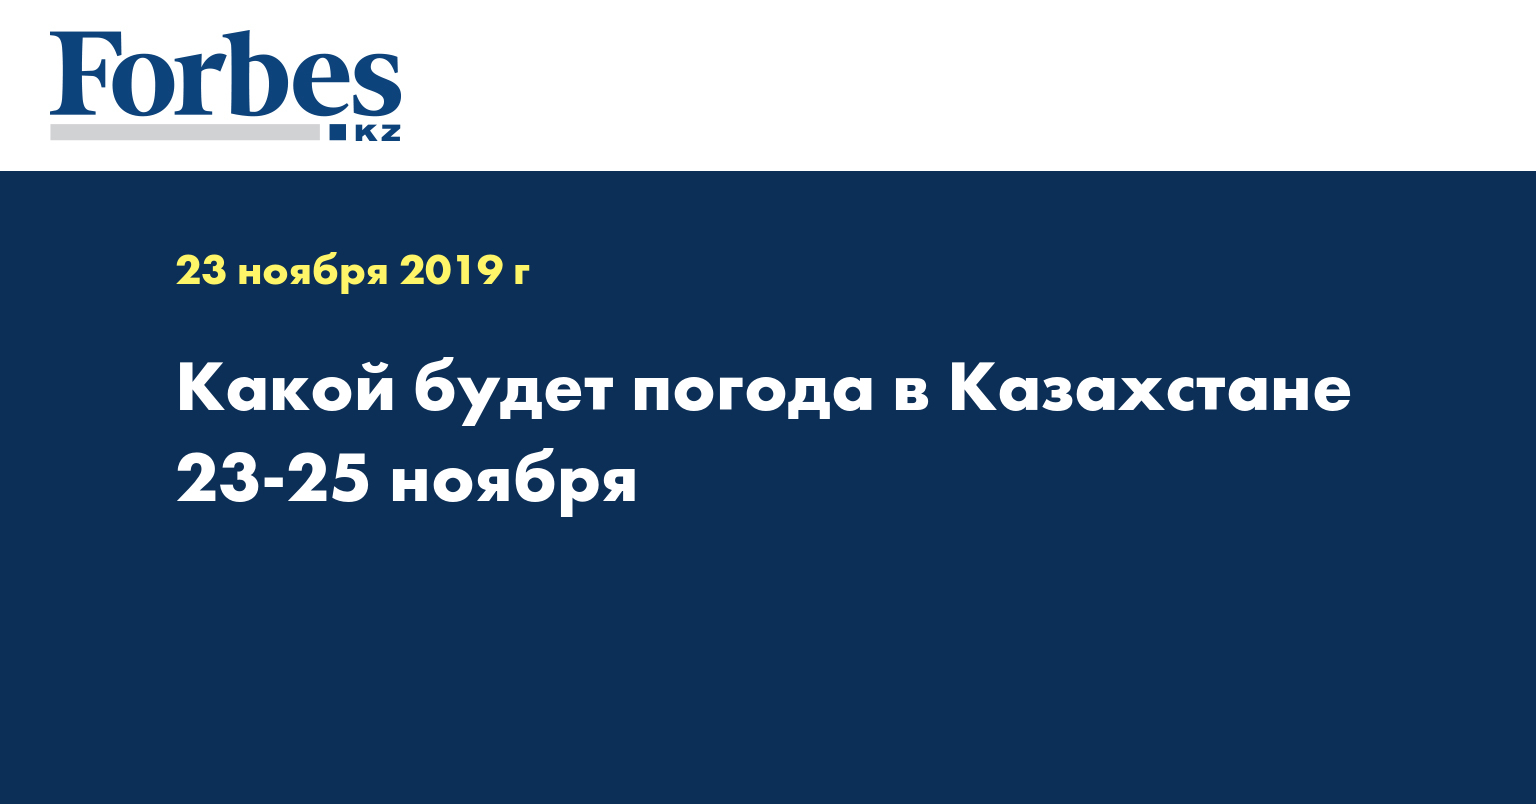 Казахстан занимает место